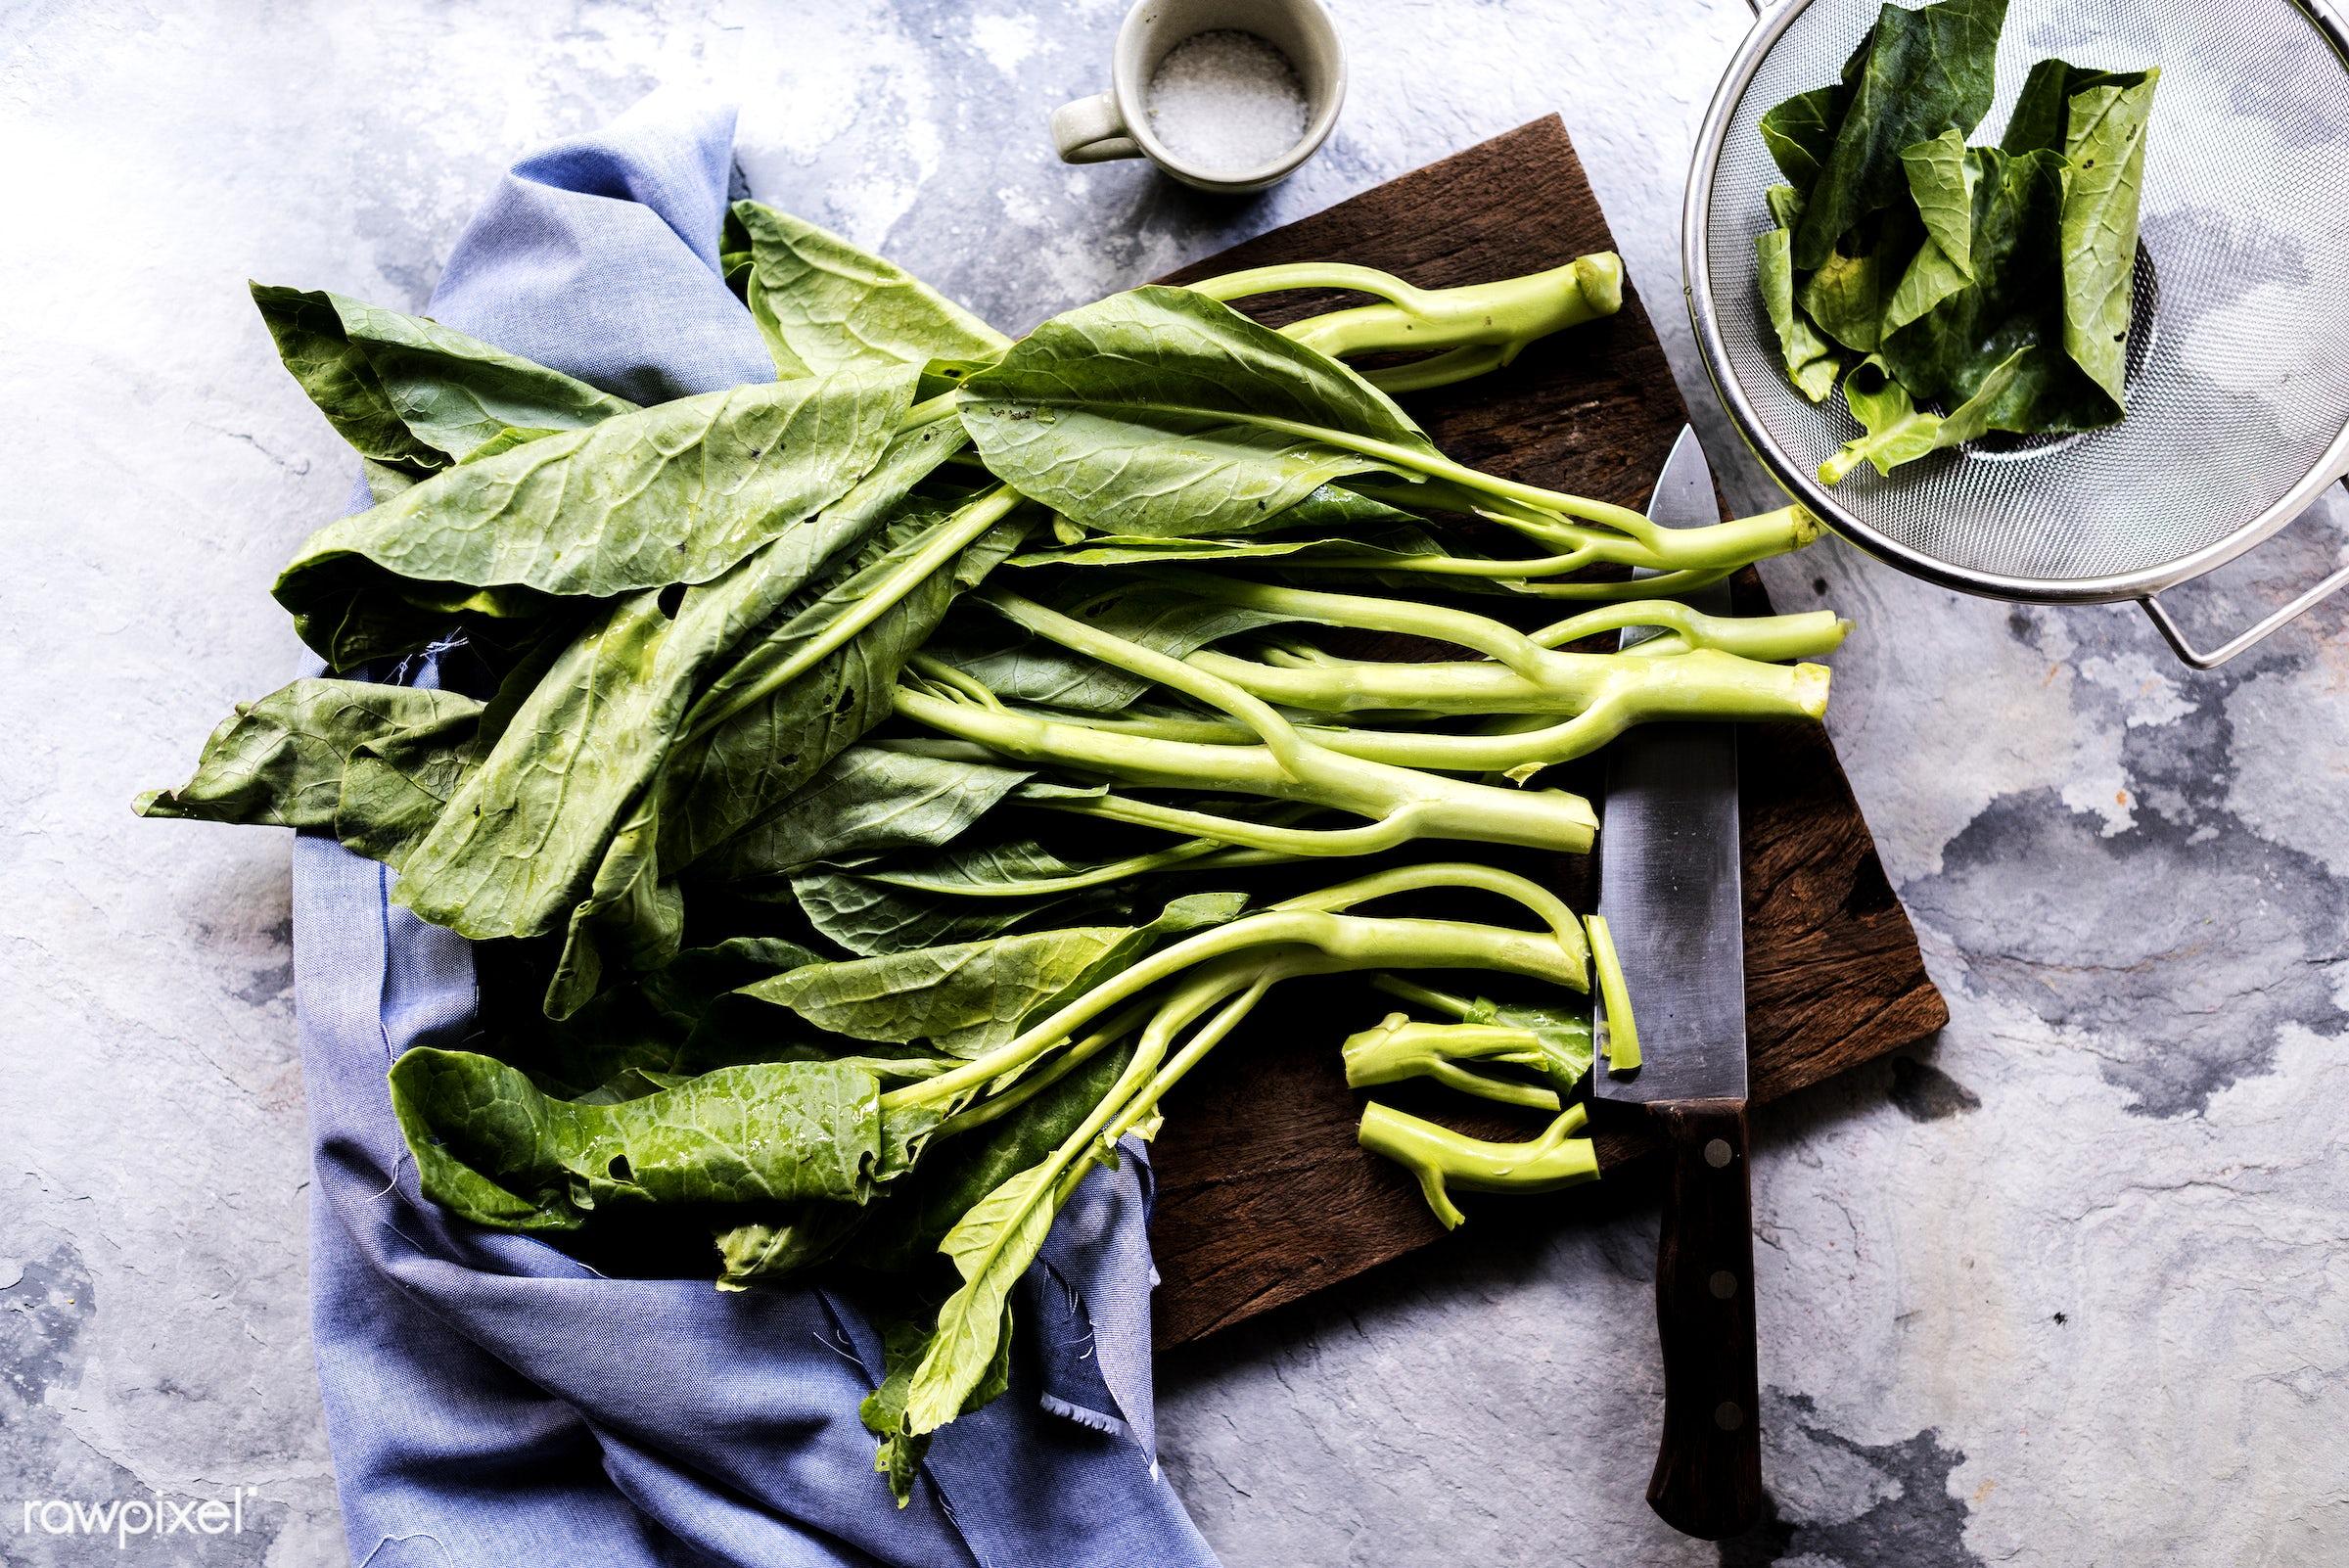 raw, chinese kale, gastronomy, type, kind, fresh, cooking, vegetarian, ingredient, gourmet, knife, nourishment, vegetables,...